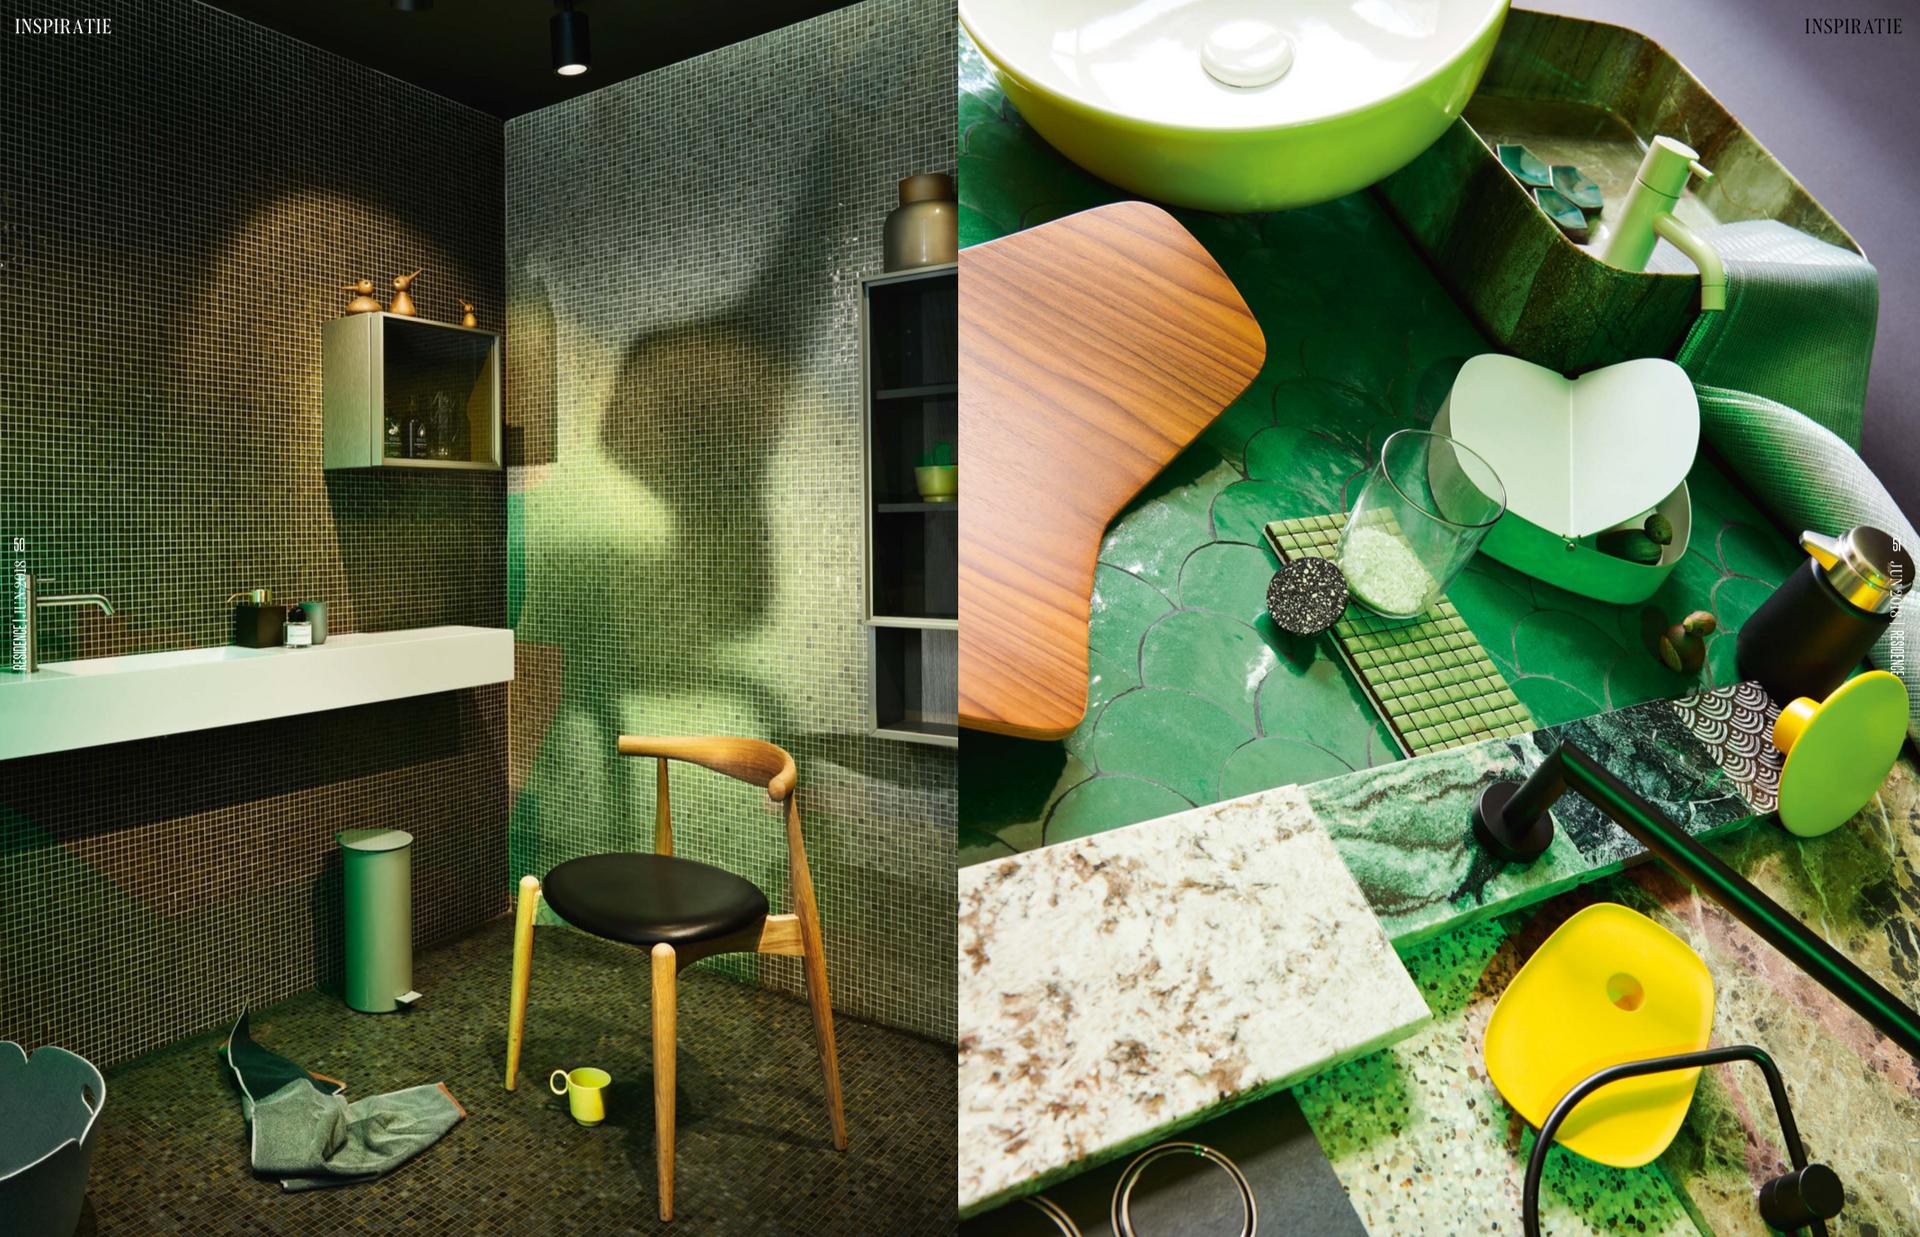 Residence-badkamers-janluijk-nanoukvanra